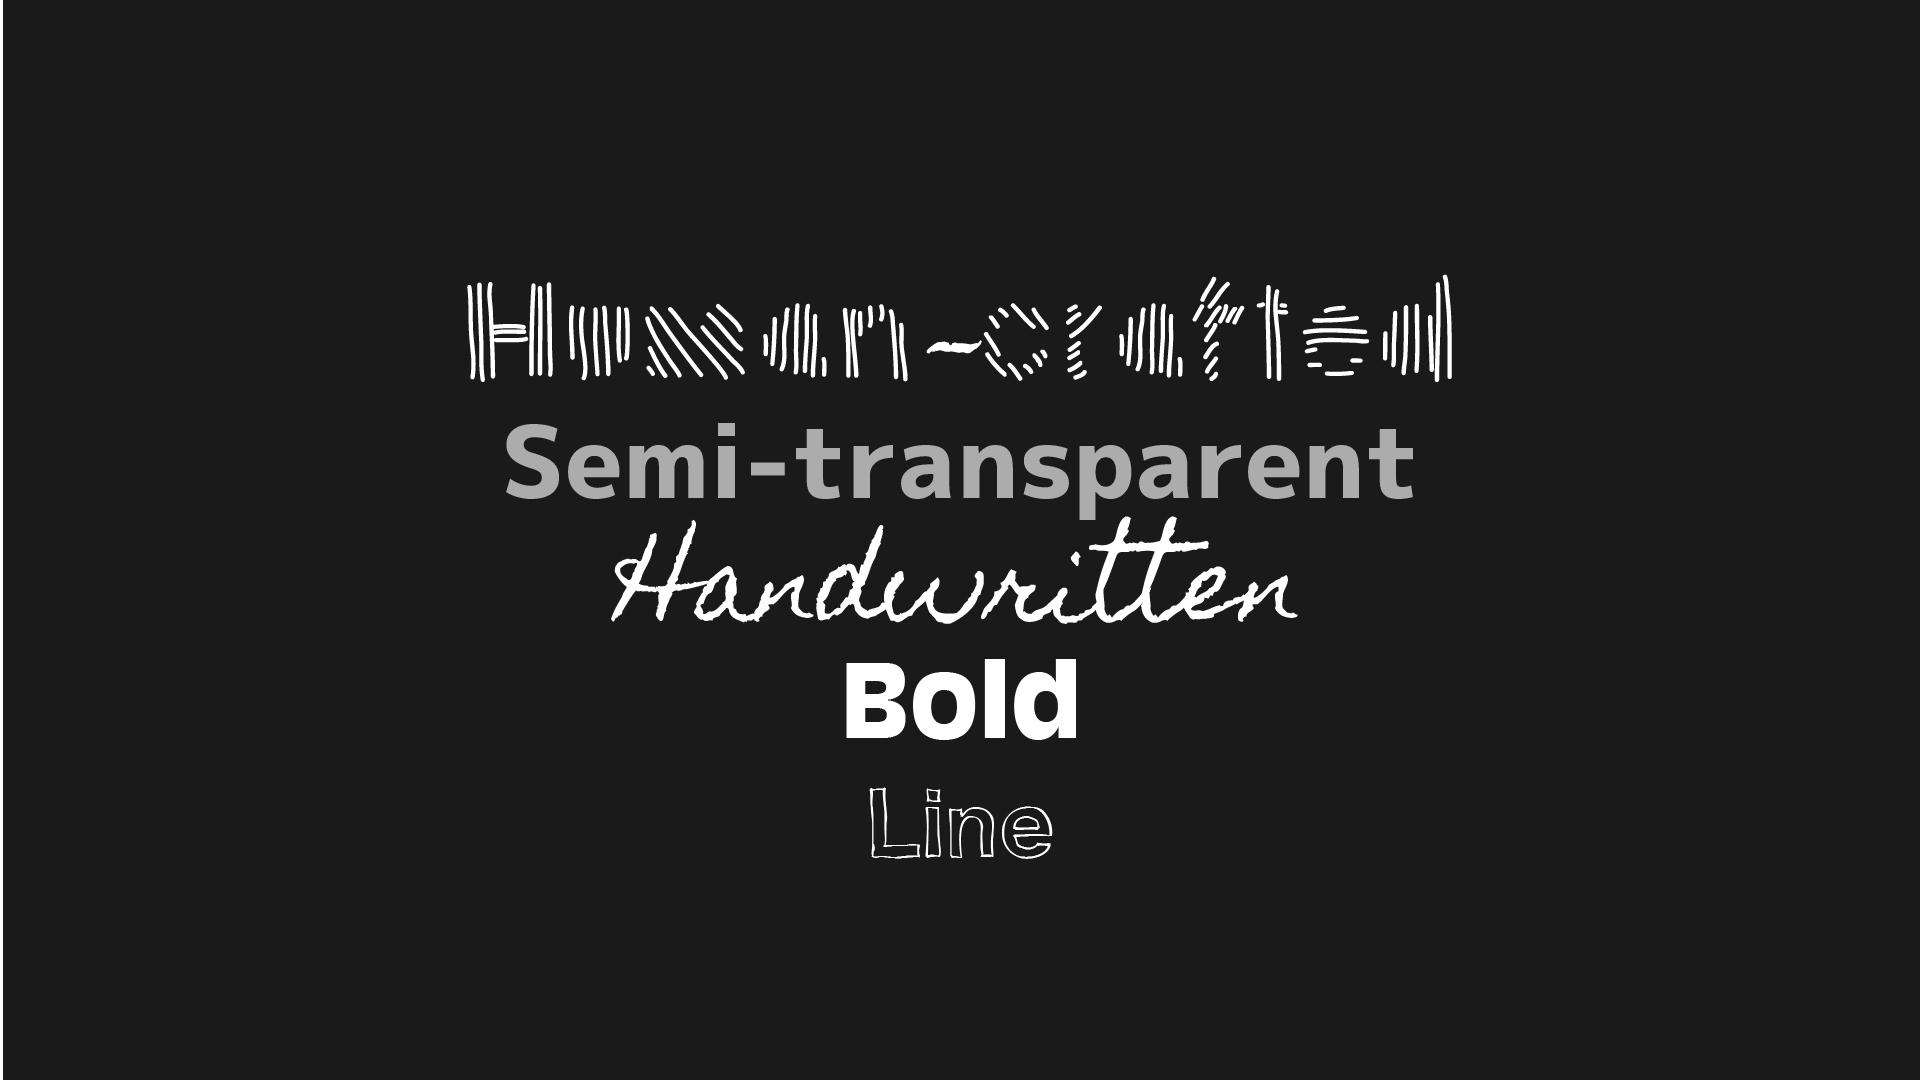 Customised fonts asa design trend